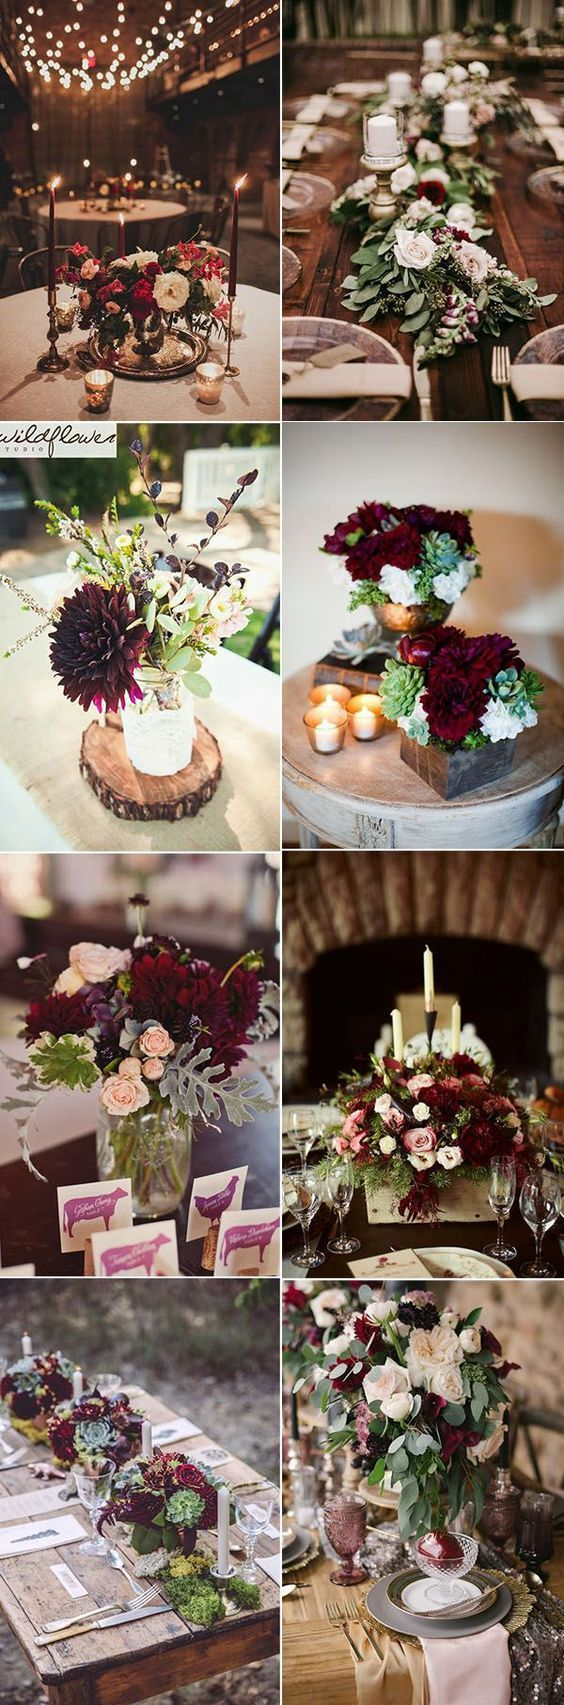 Wedding venue decorations ideas november 2018  best wedding images on Pinterest  Wedding ideas Wedding